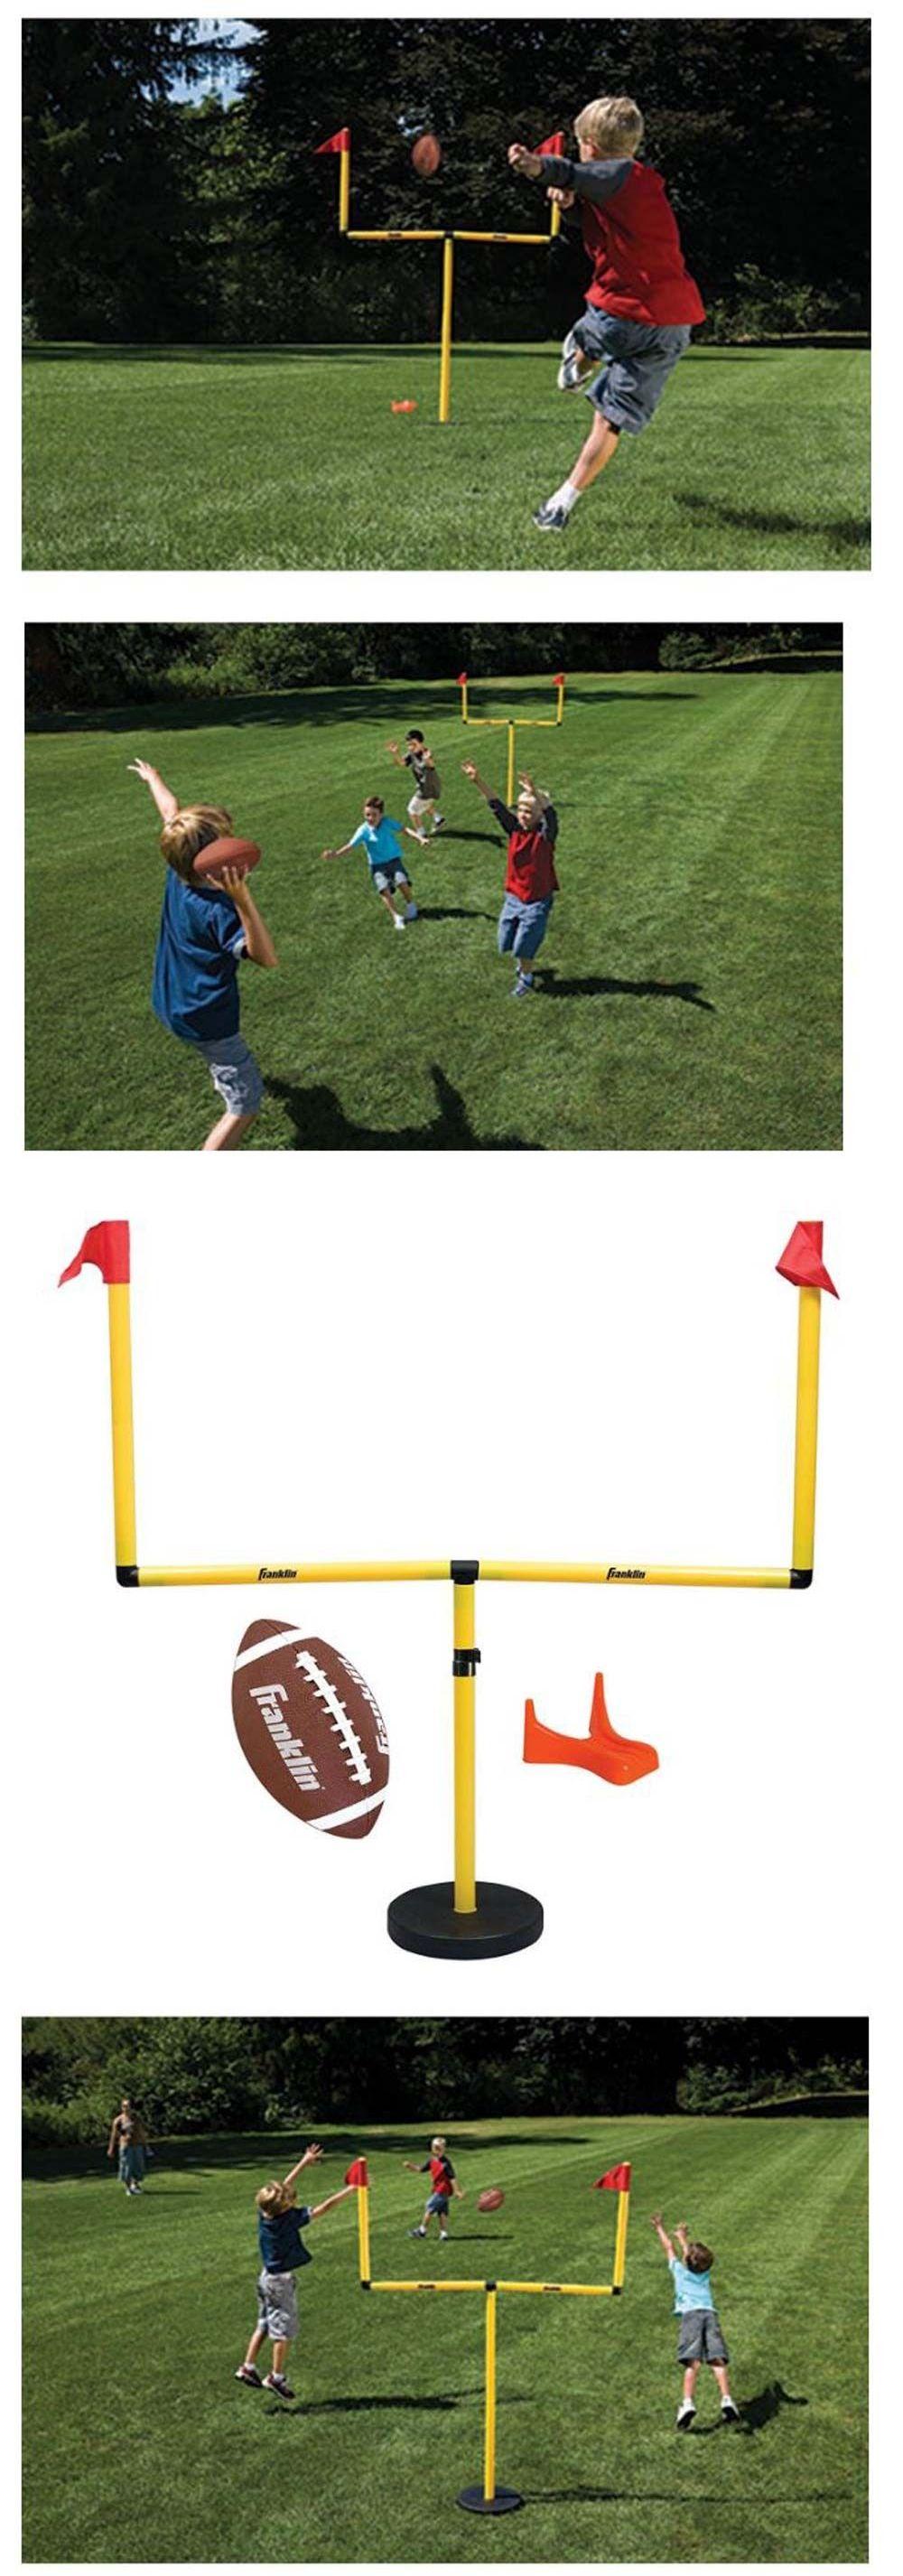 training aids 159119 football goal post set for kids backyard